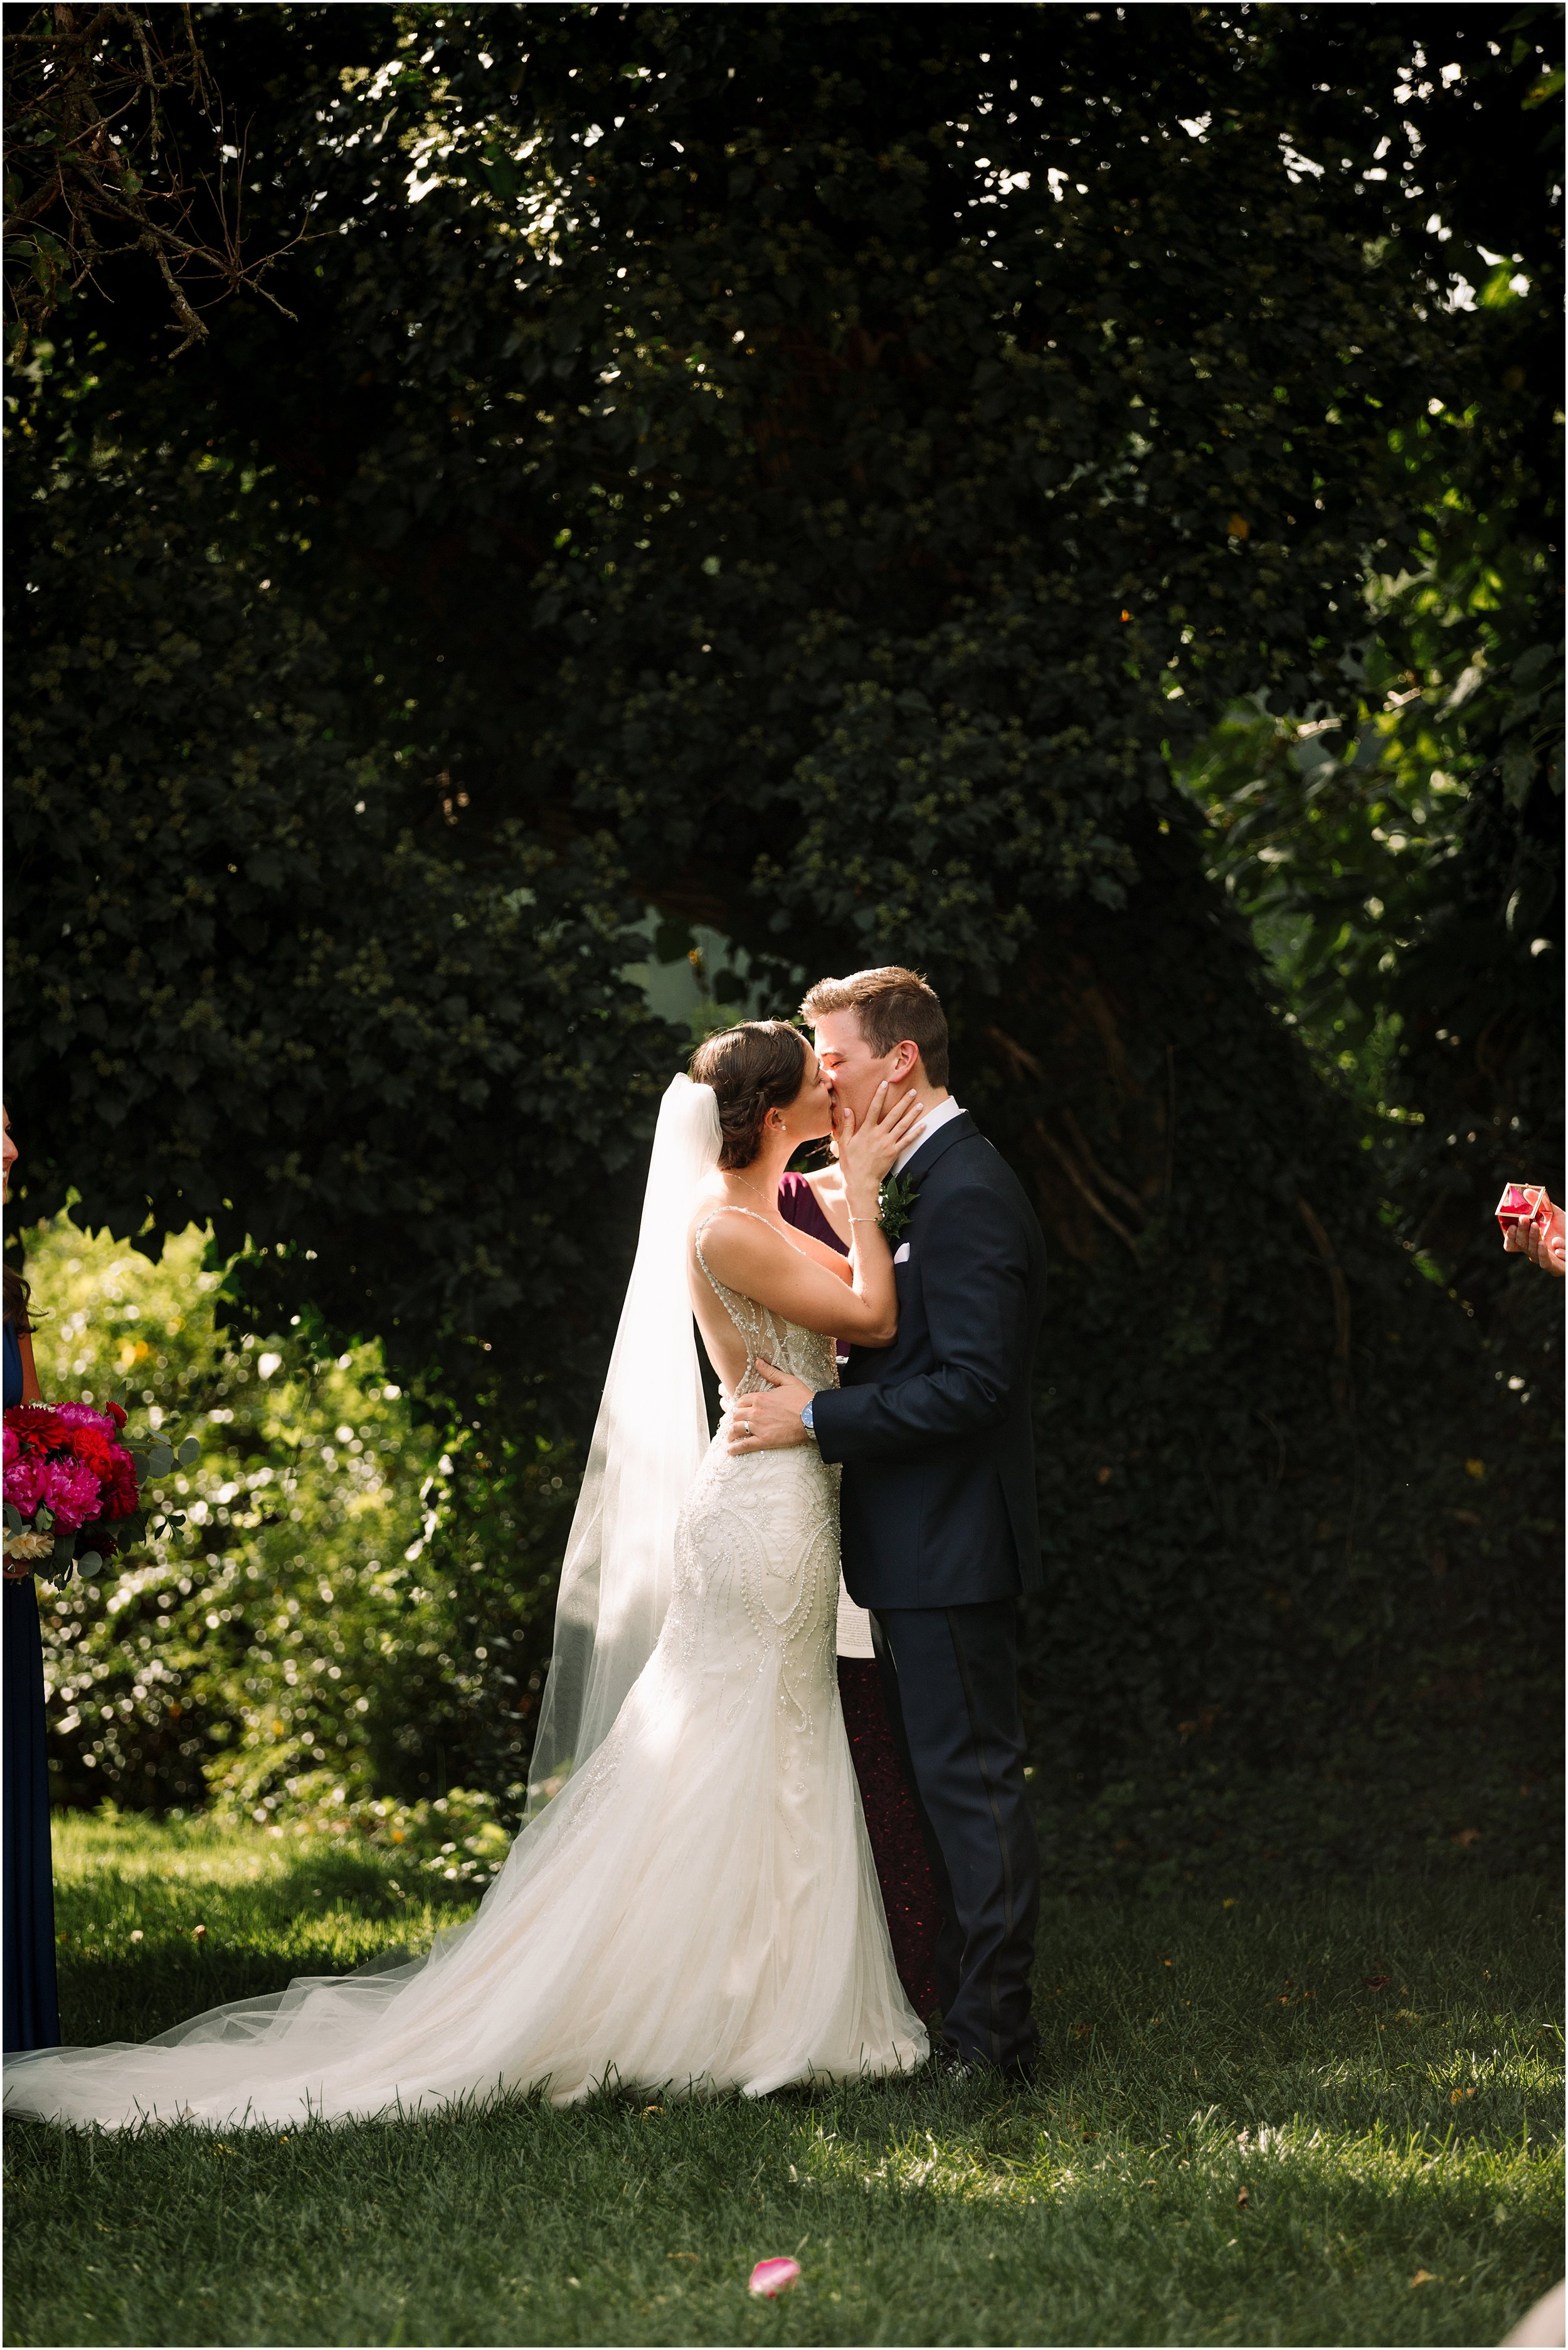 hannah leigh photography Antrim 1844 Wedding_1217.jpg